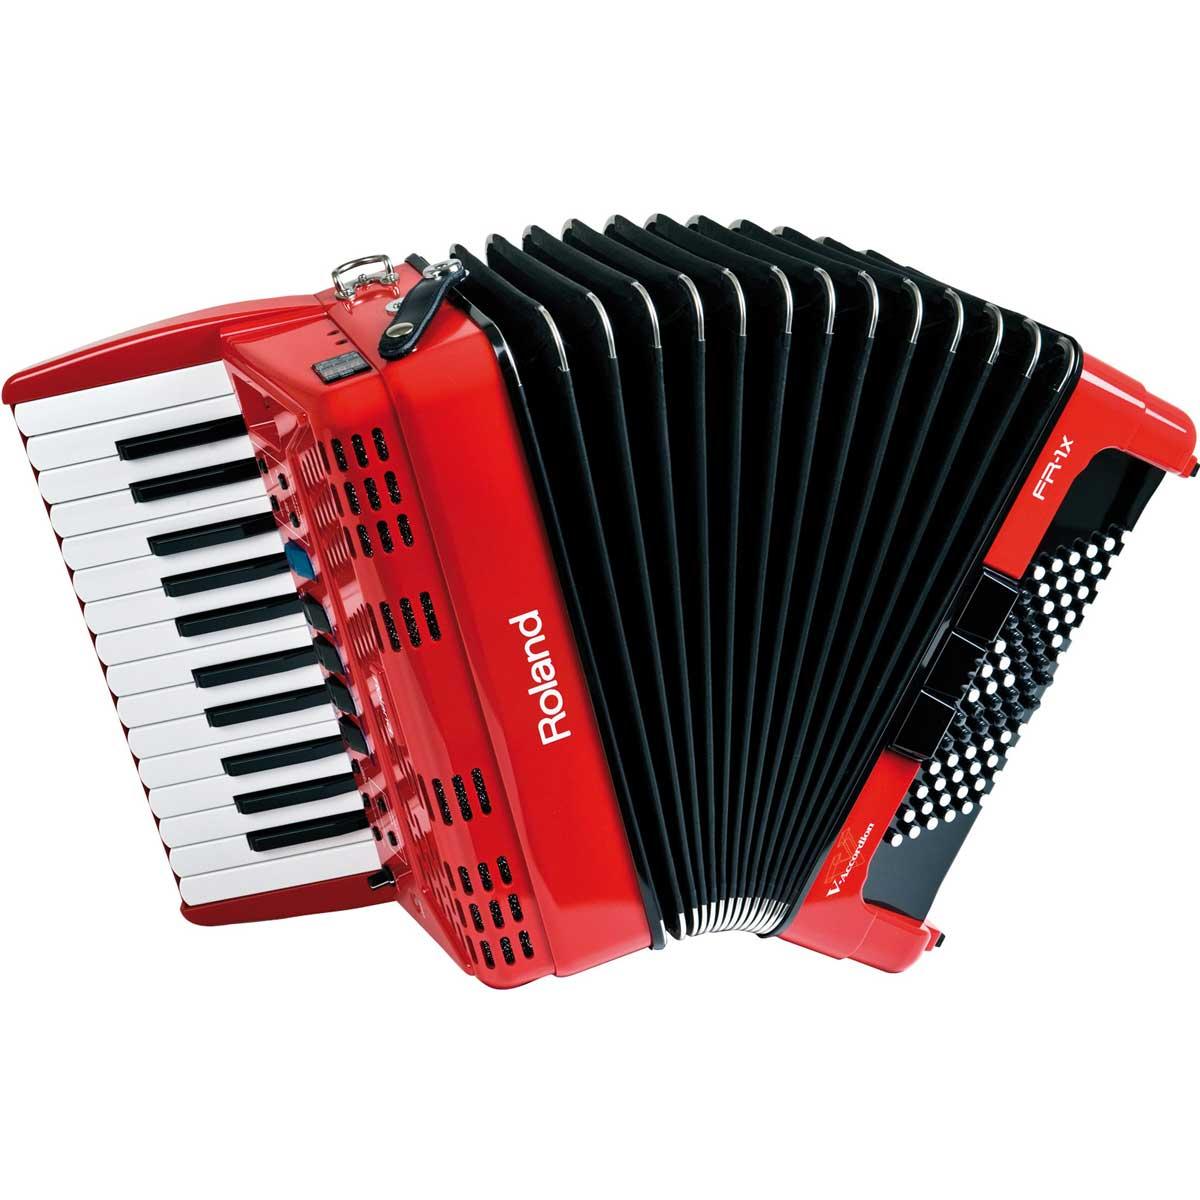 Roland ローランド / V-Accordion FR-1X RD レッド Vアコーディオン ピアノ鍵盤タイプ【お取り寄せ商品】【YRK】